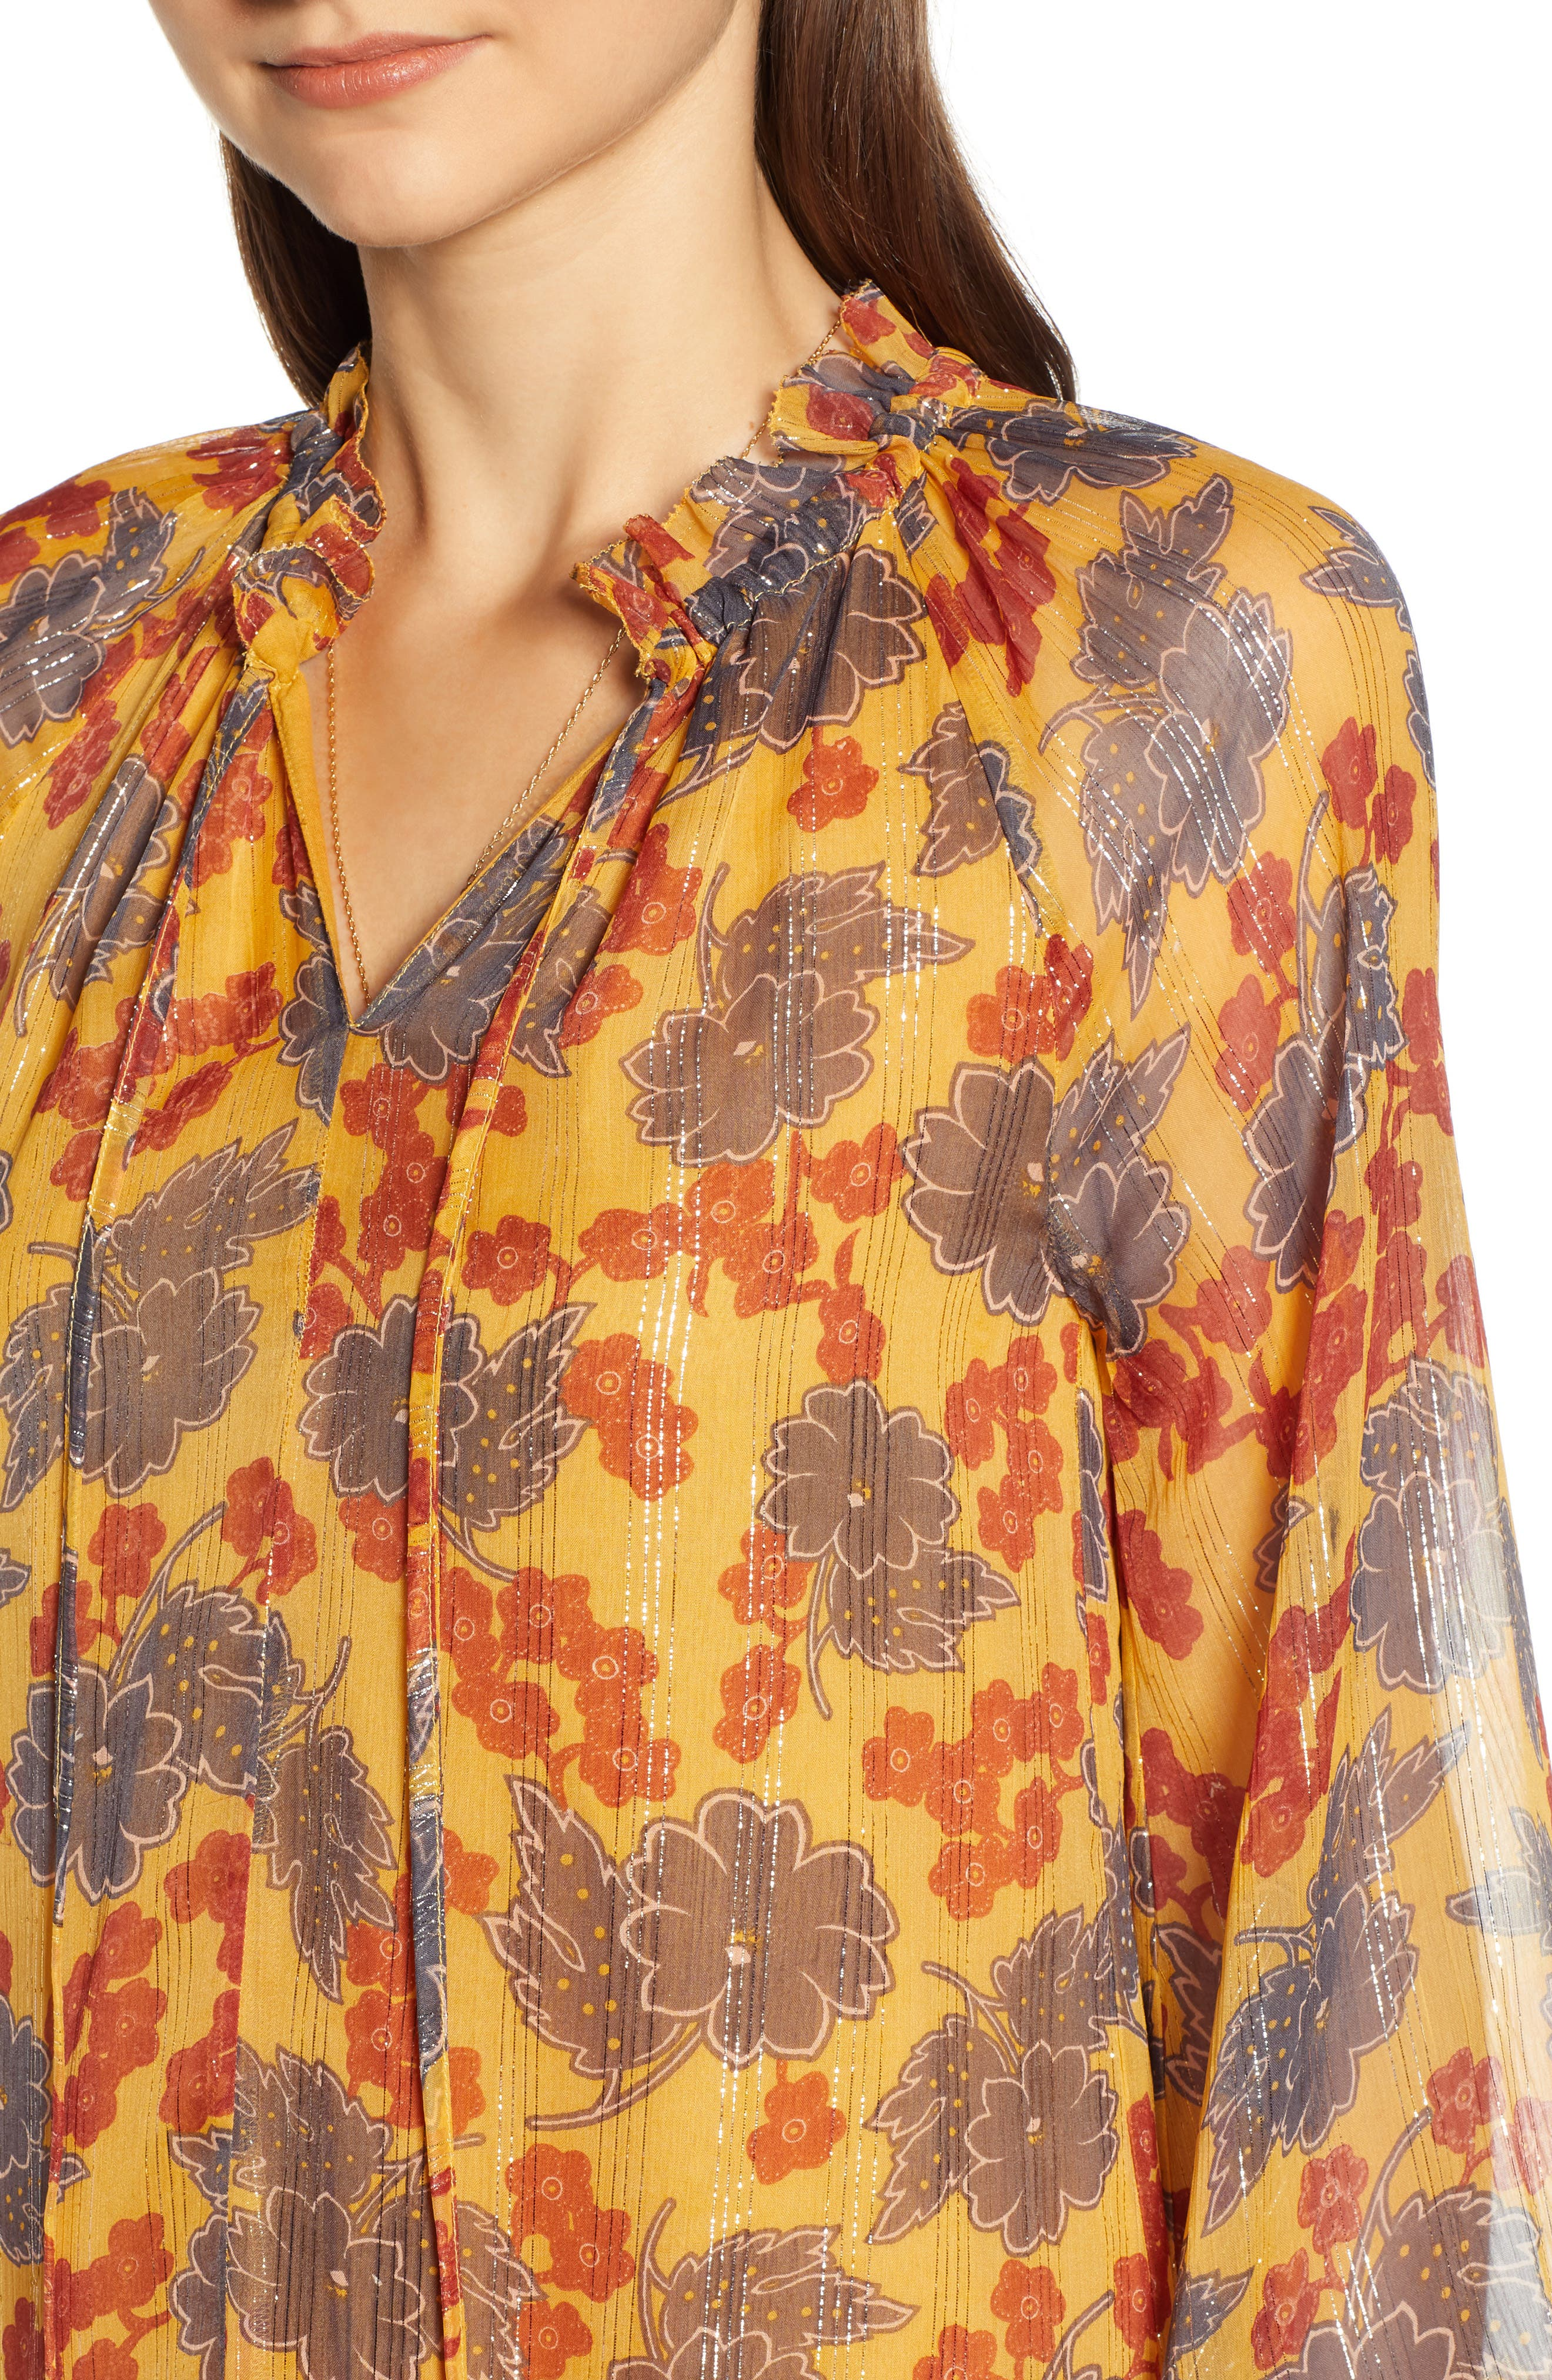 Metallic Stripe Floral Print Dress,                             Alternate thumbnail 4, color,                             YELLOW AND BURGUNDY